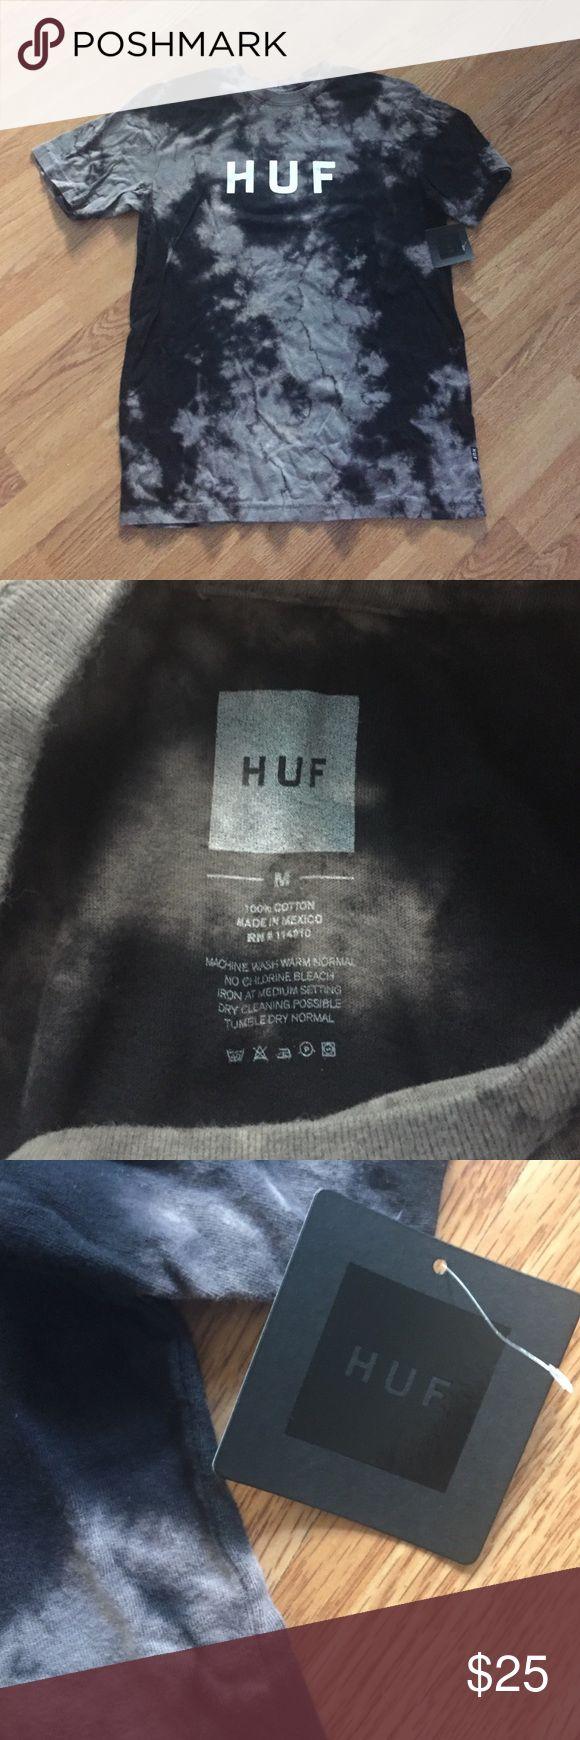 NWT HUF Bleached Washed Original Tee NWT HUF Bleached Washed Original Tee size medium HUF Shirts Tees - Short Sleeve